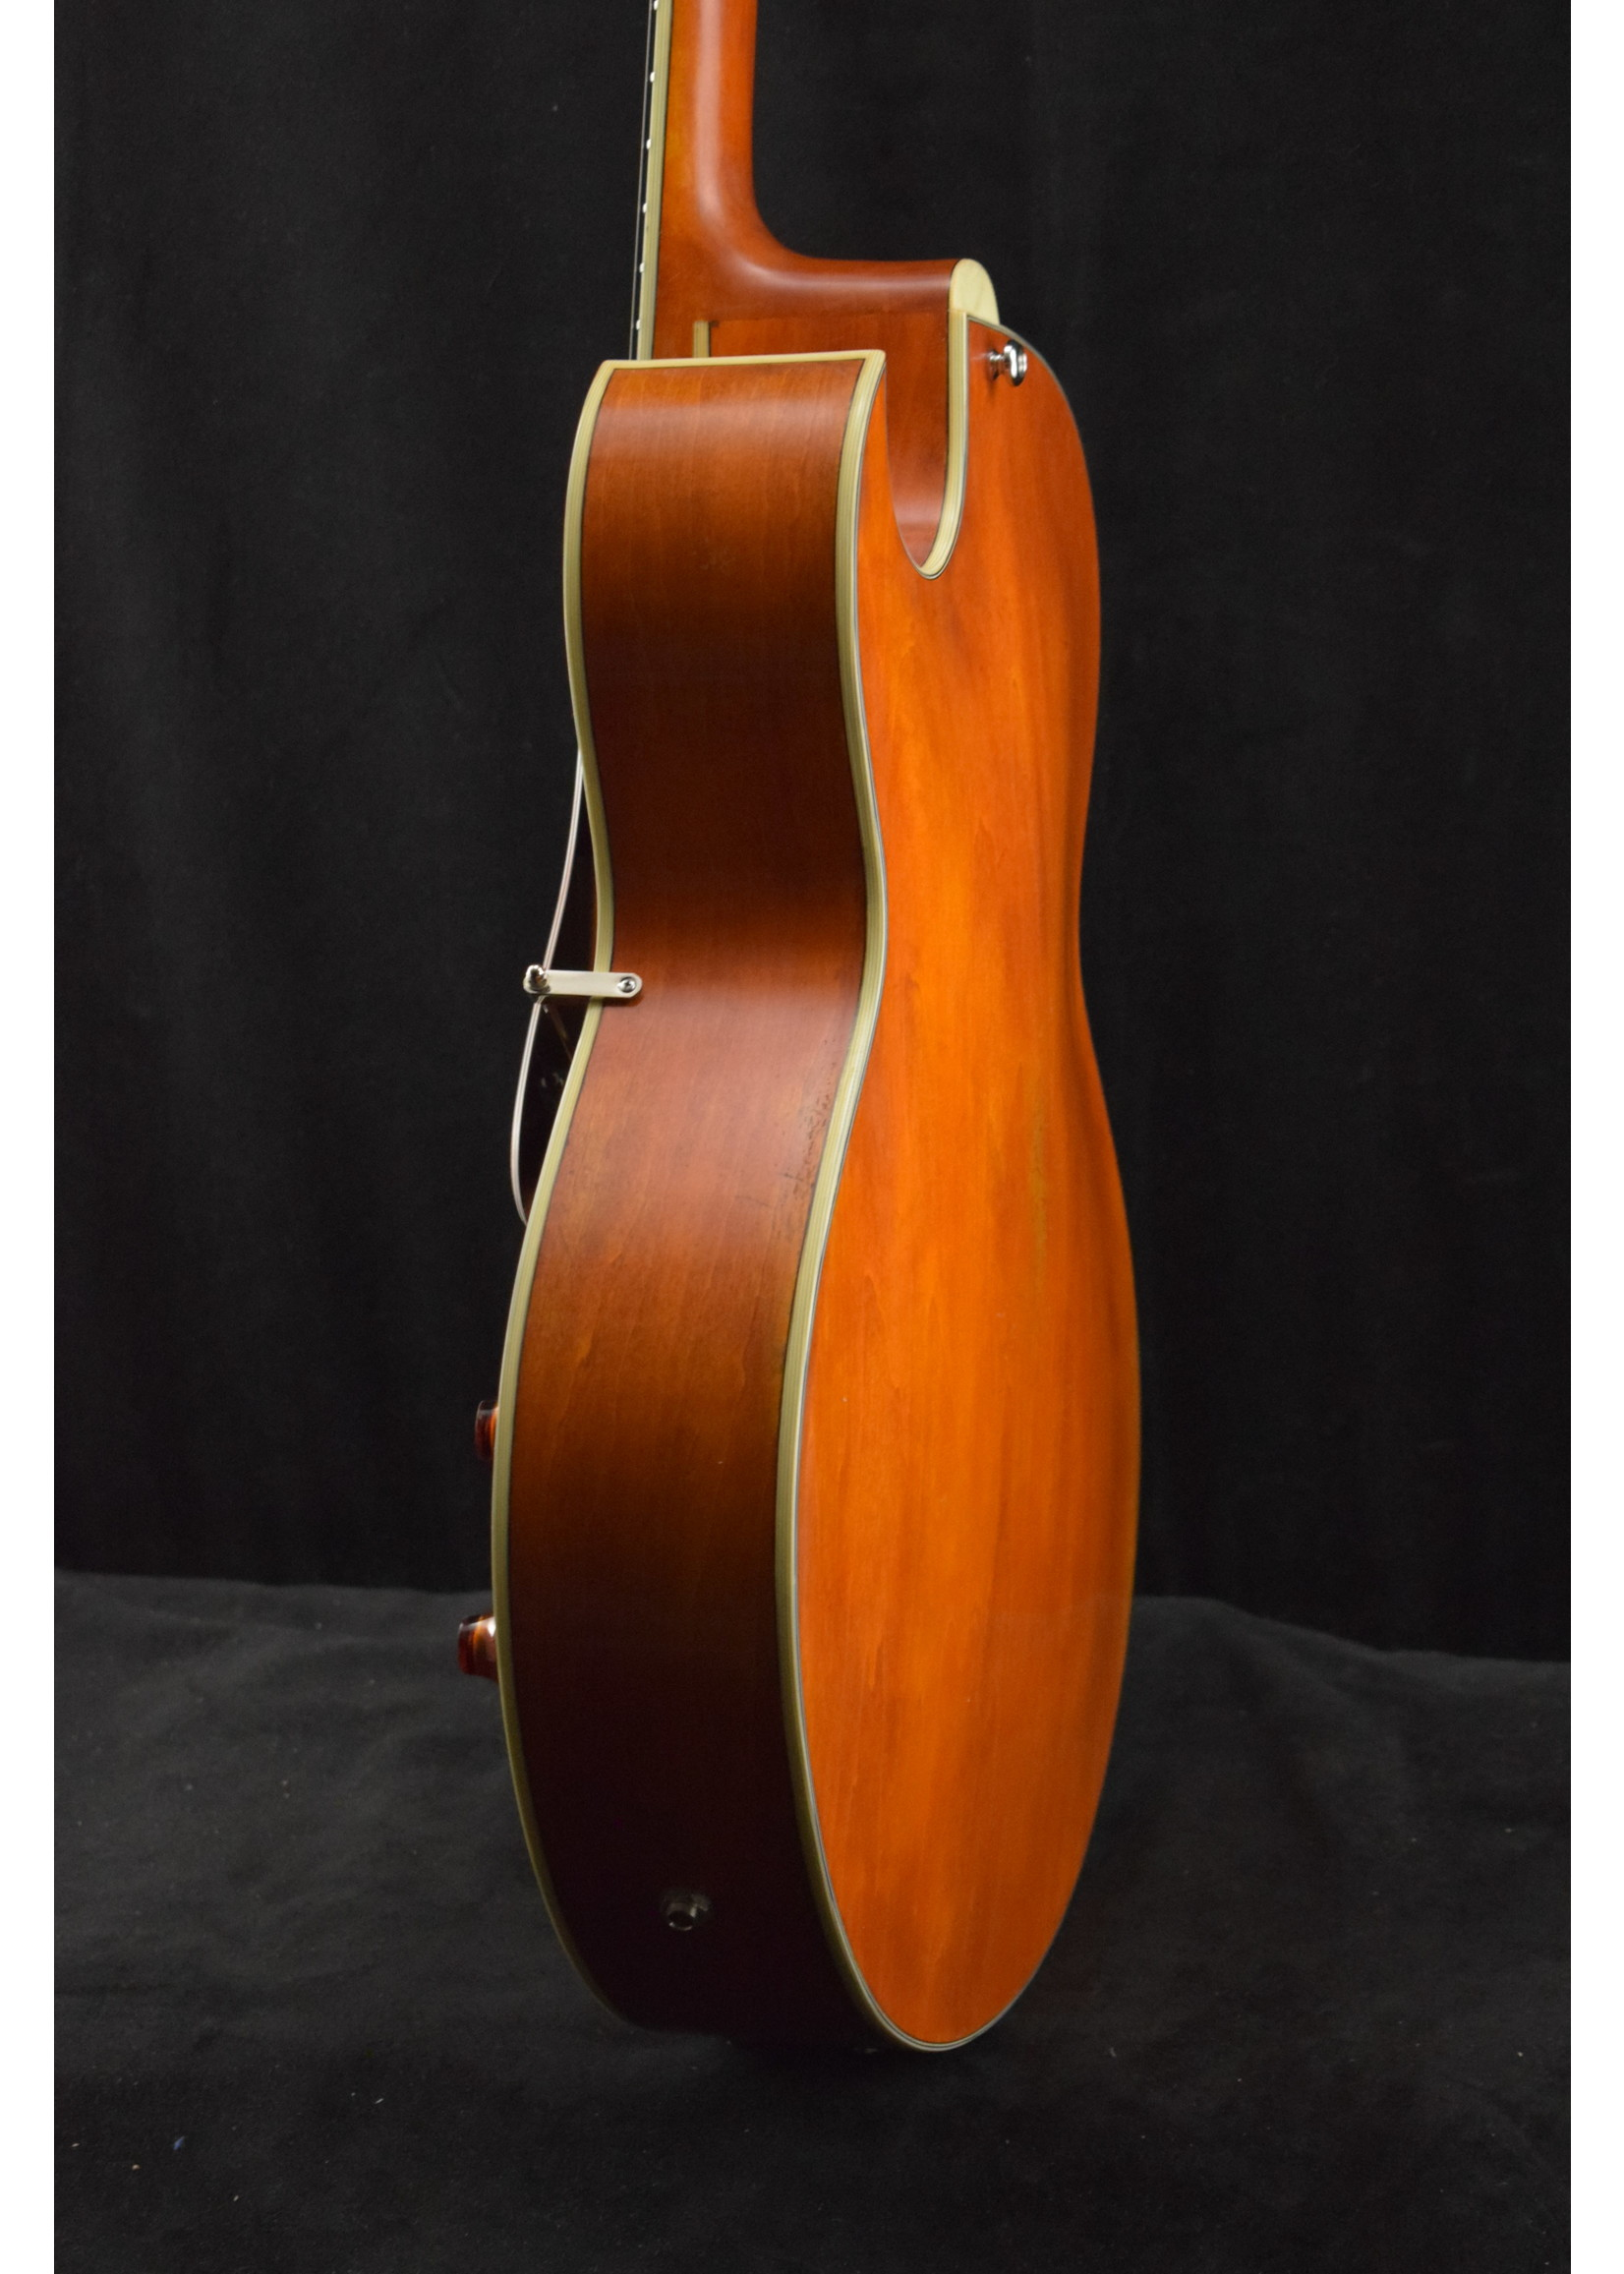 Eastman Eastman T49D/V-AMB Dual Pickup Laminate Electric Archtop Antique Varnish Amber Finish